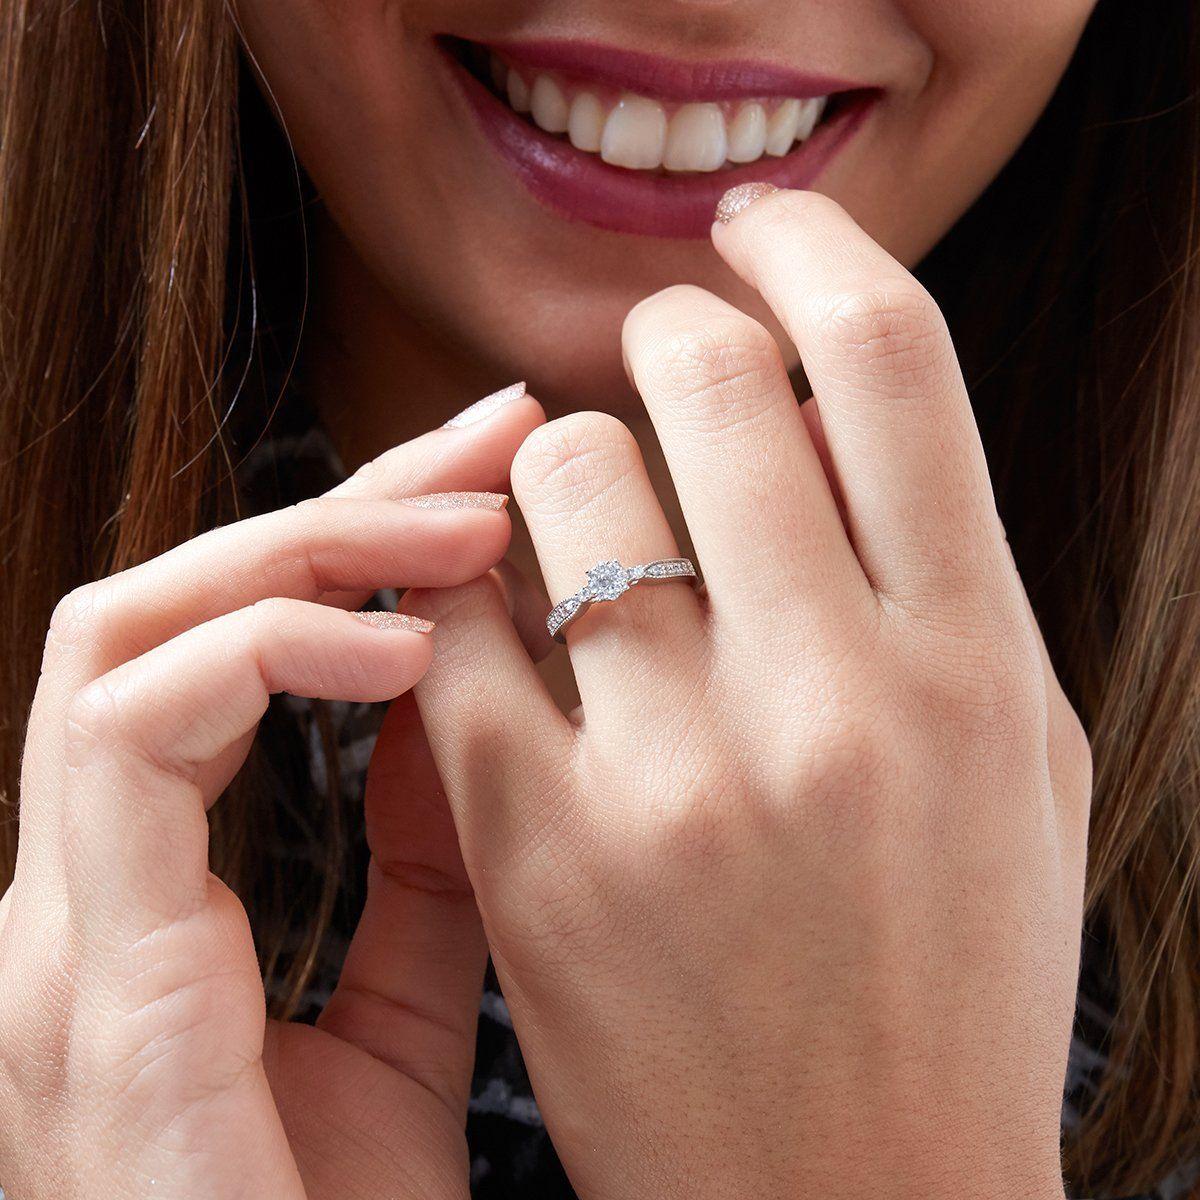 10k 14k White Gold 925 Silver 1 3 Carat G H Color Brilliant Round Lab Diamond Engagement Ring Lab Diamond Engagement Ring Grown Diamond Engagement Ring Sizes